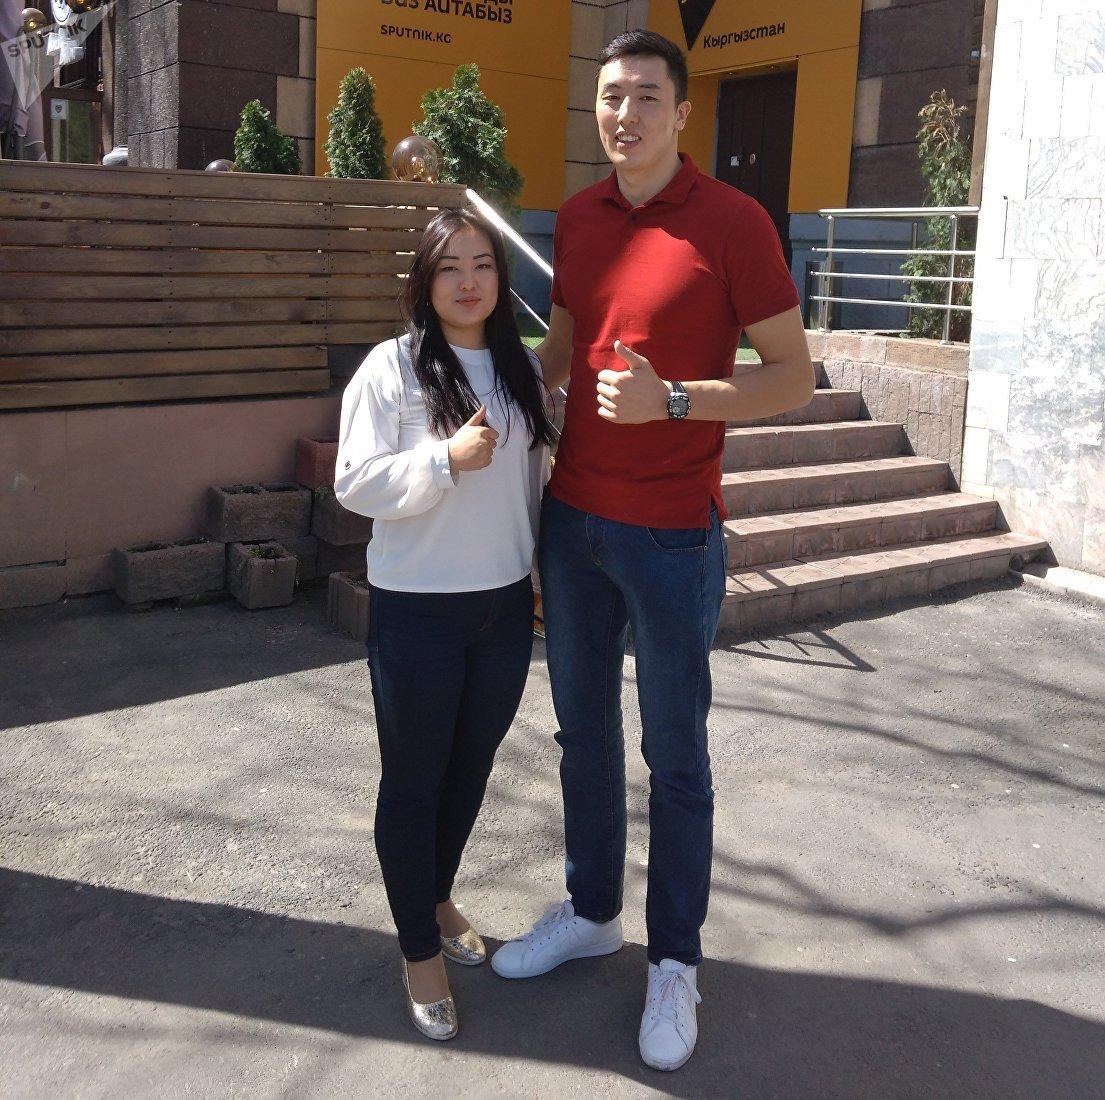 Капитан сборной команды Кыргызстана по волейболу, игрок Таиландской команды Эйр Форс Онолбек Каныбек уулу и журналист Гульдана Талантбекова